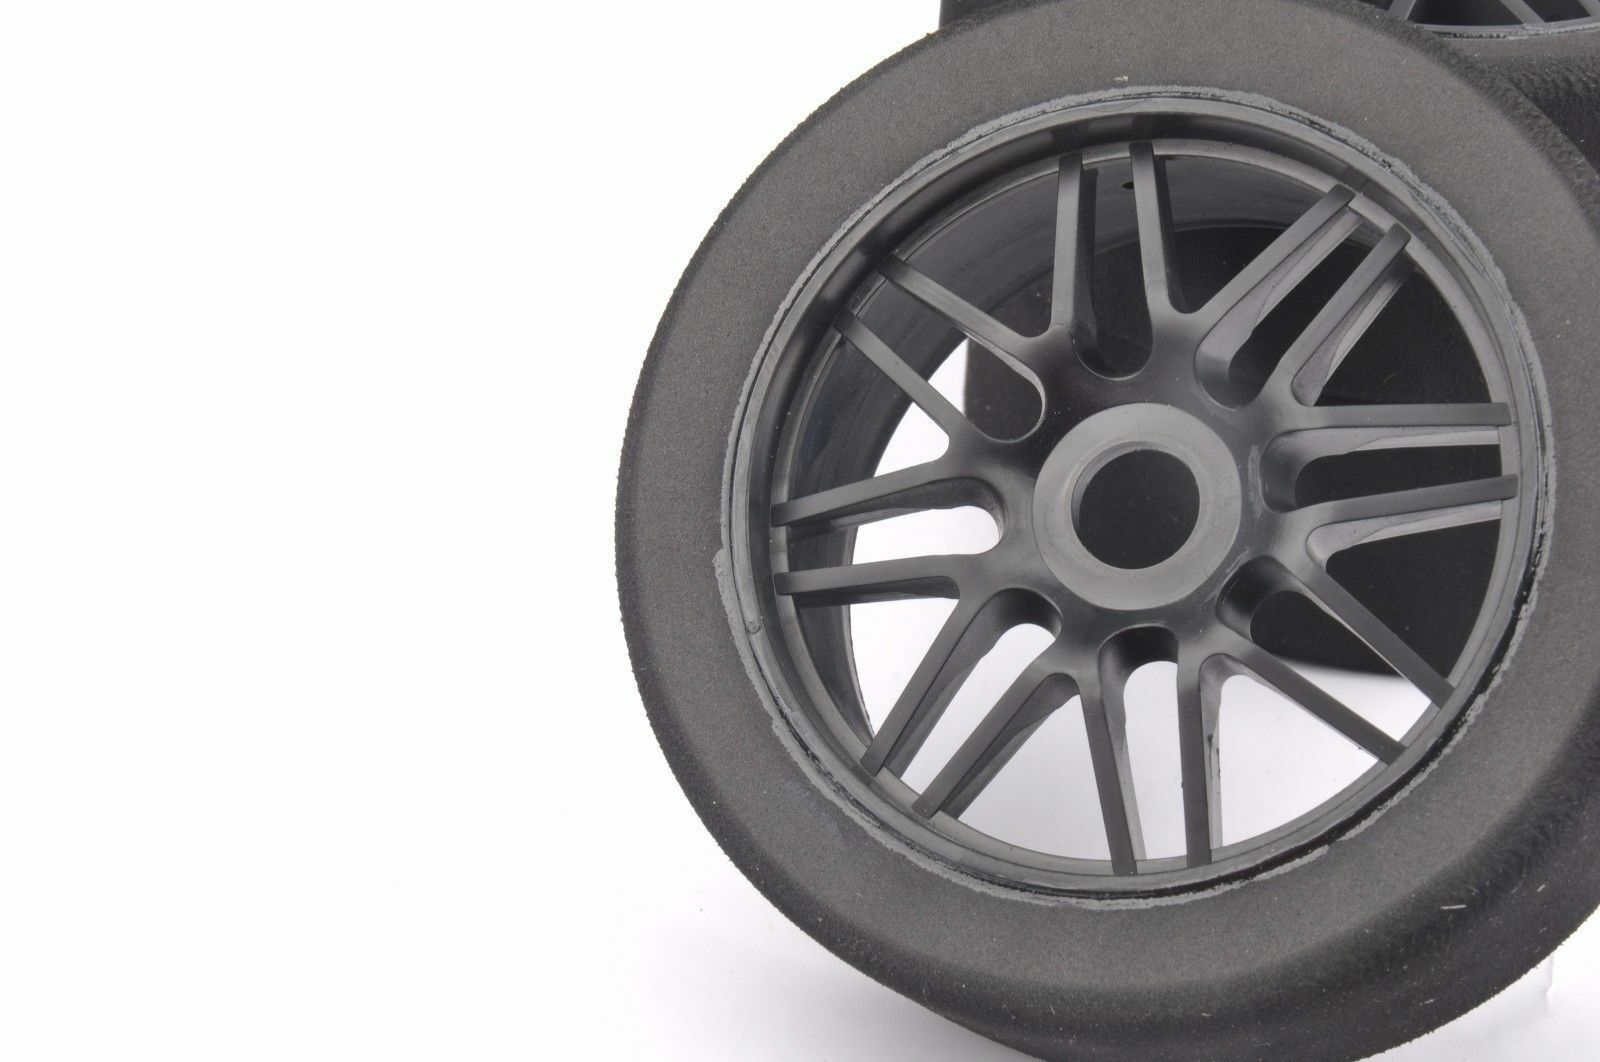 4Pcs 1 8 Foam Tires & Nylon Nylon Nylon Wheel 17mm Hex For GT X0-1 RC On Road Racing Car fdced3